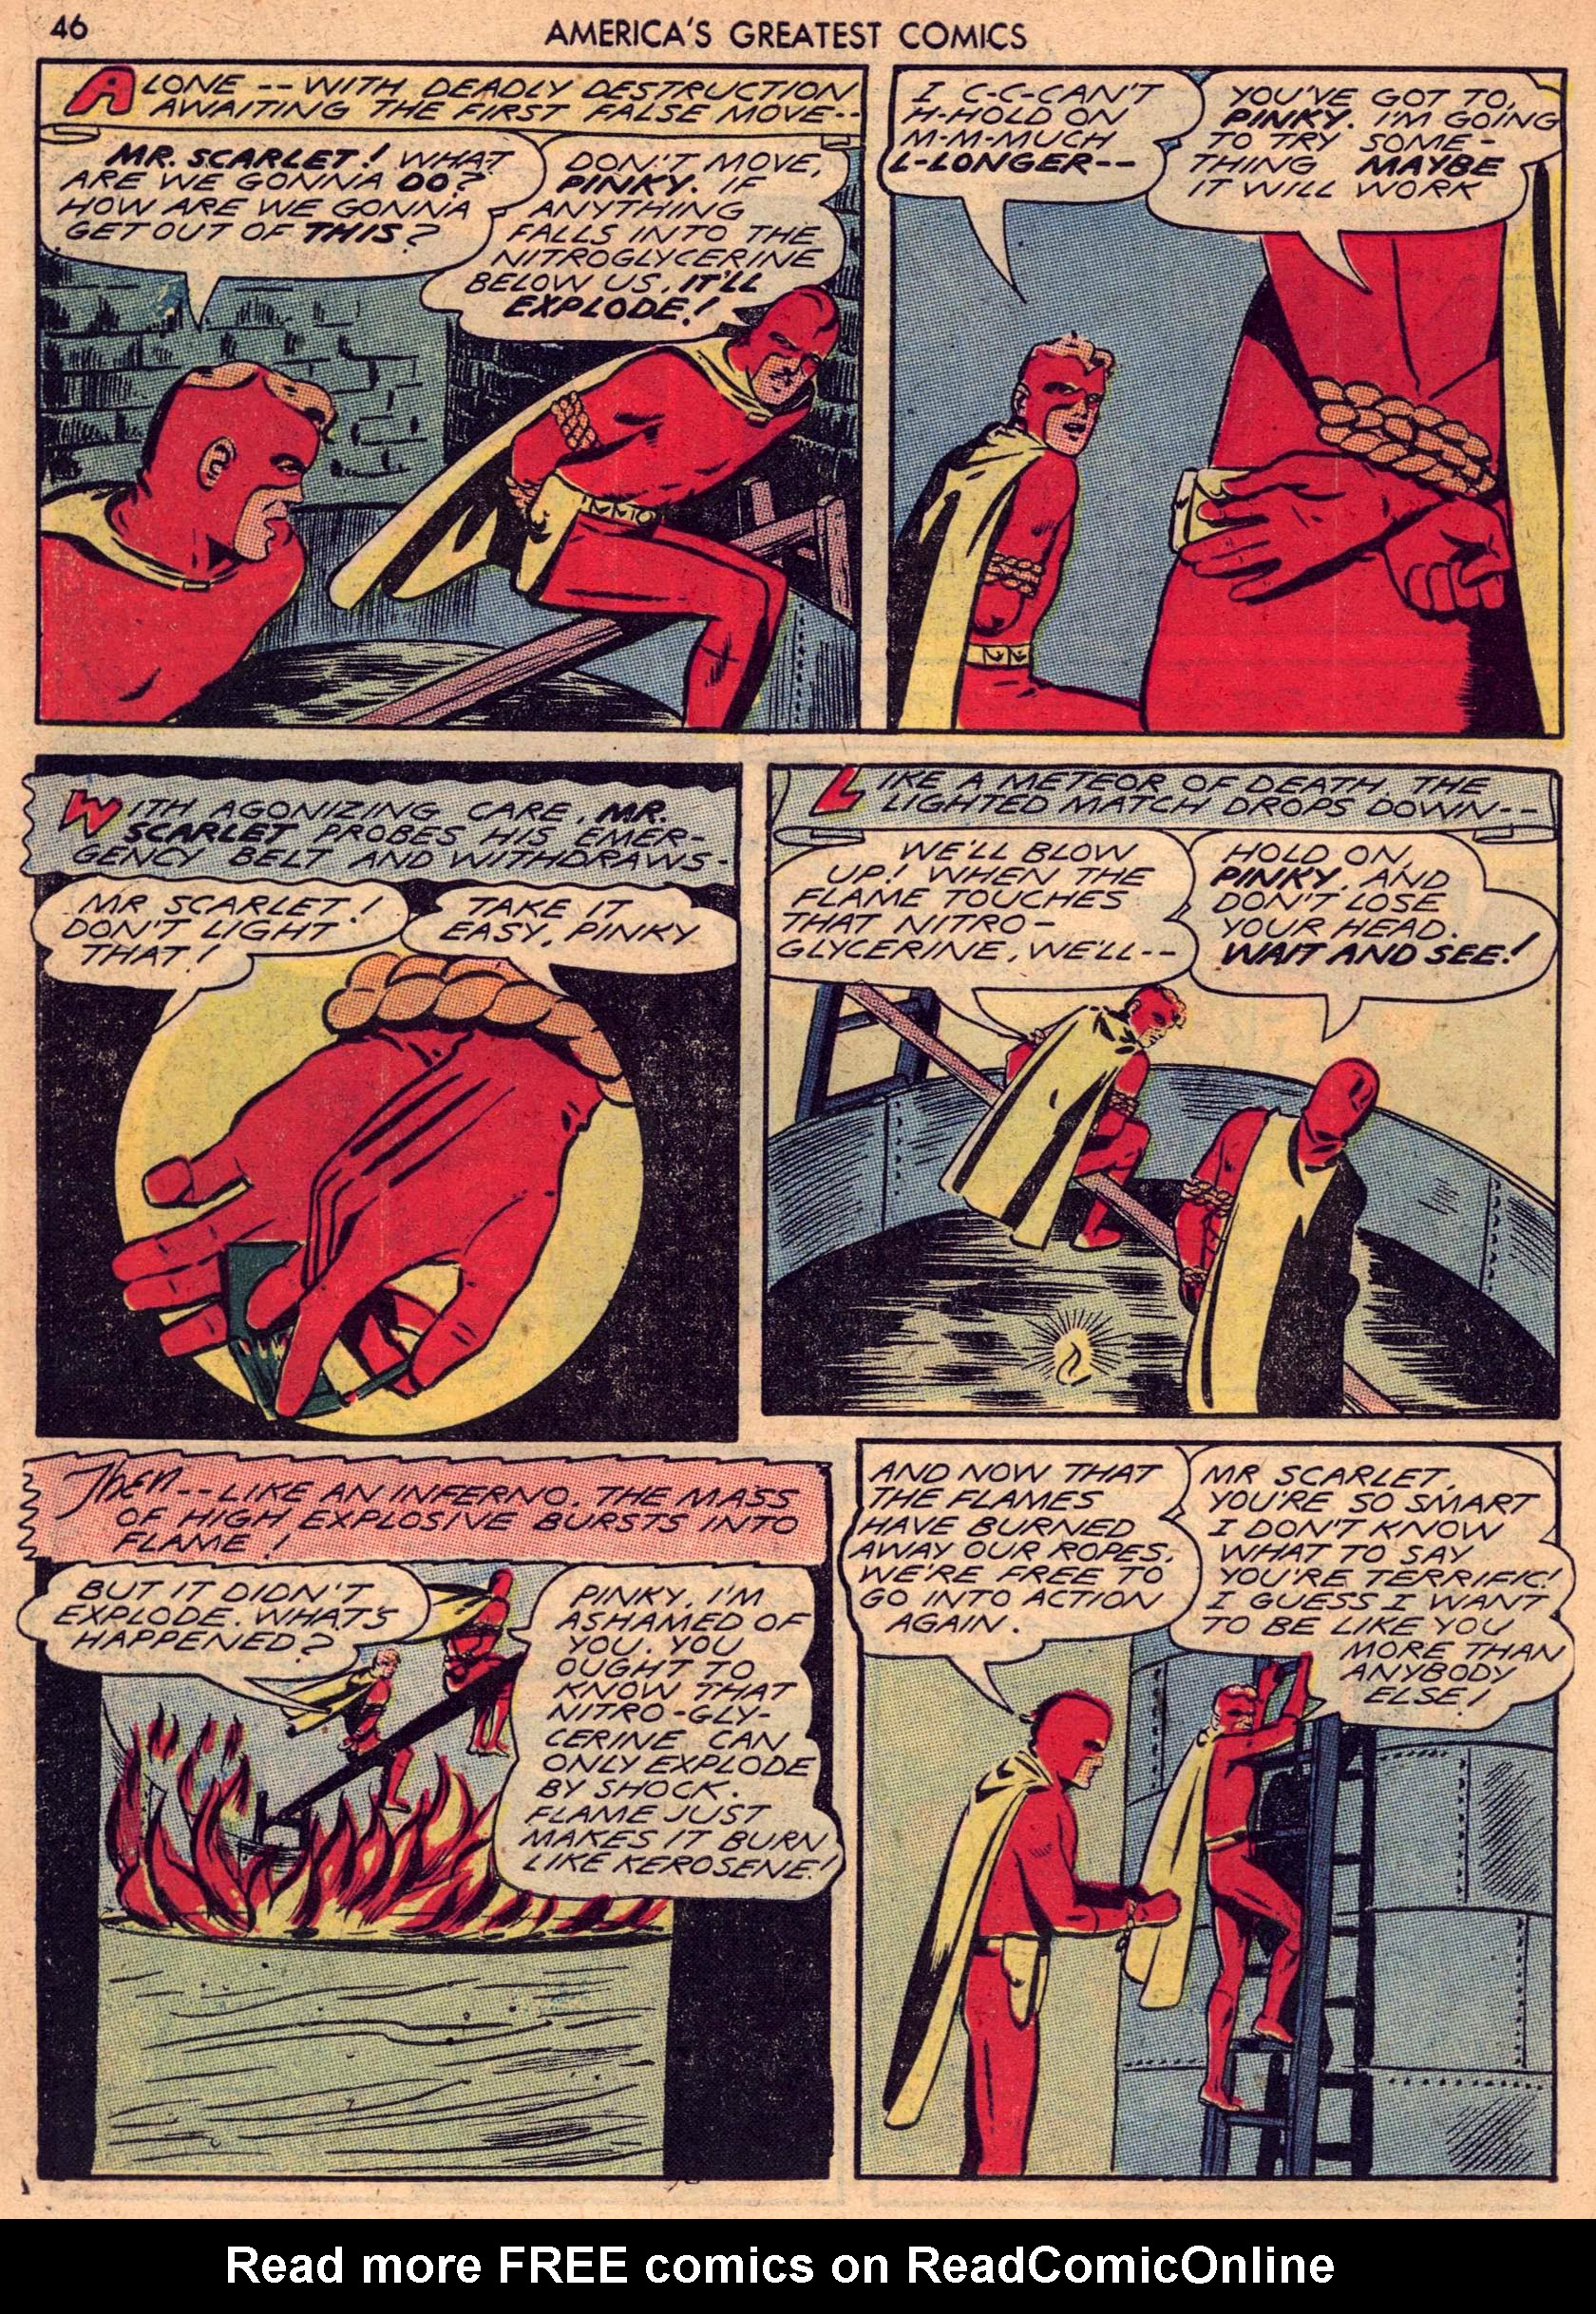 Read online America's Greatest Comics comic -  Issue #7 - 45